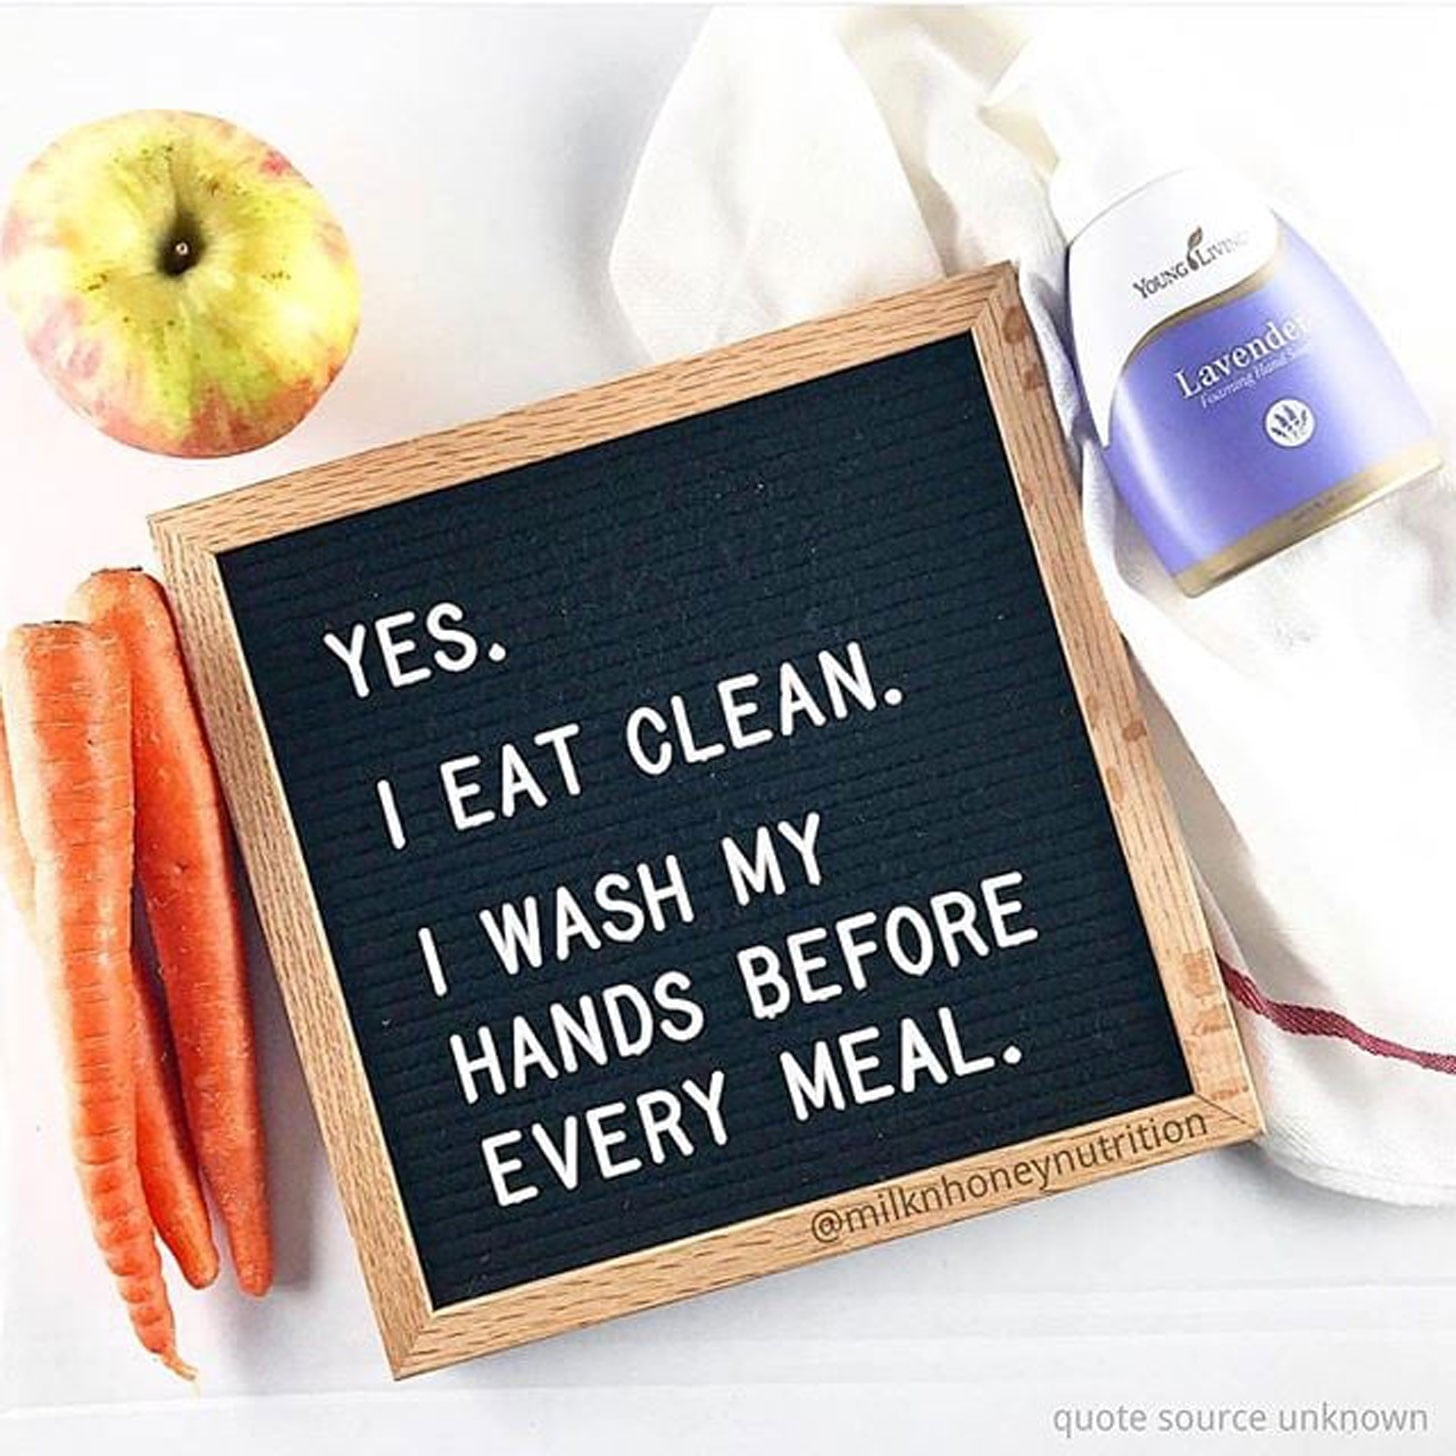 Funny Clean Eating Memes | POPSUGAR Fitness